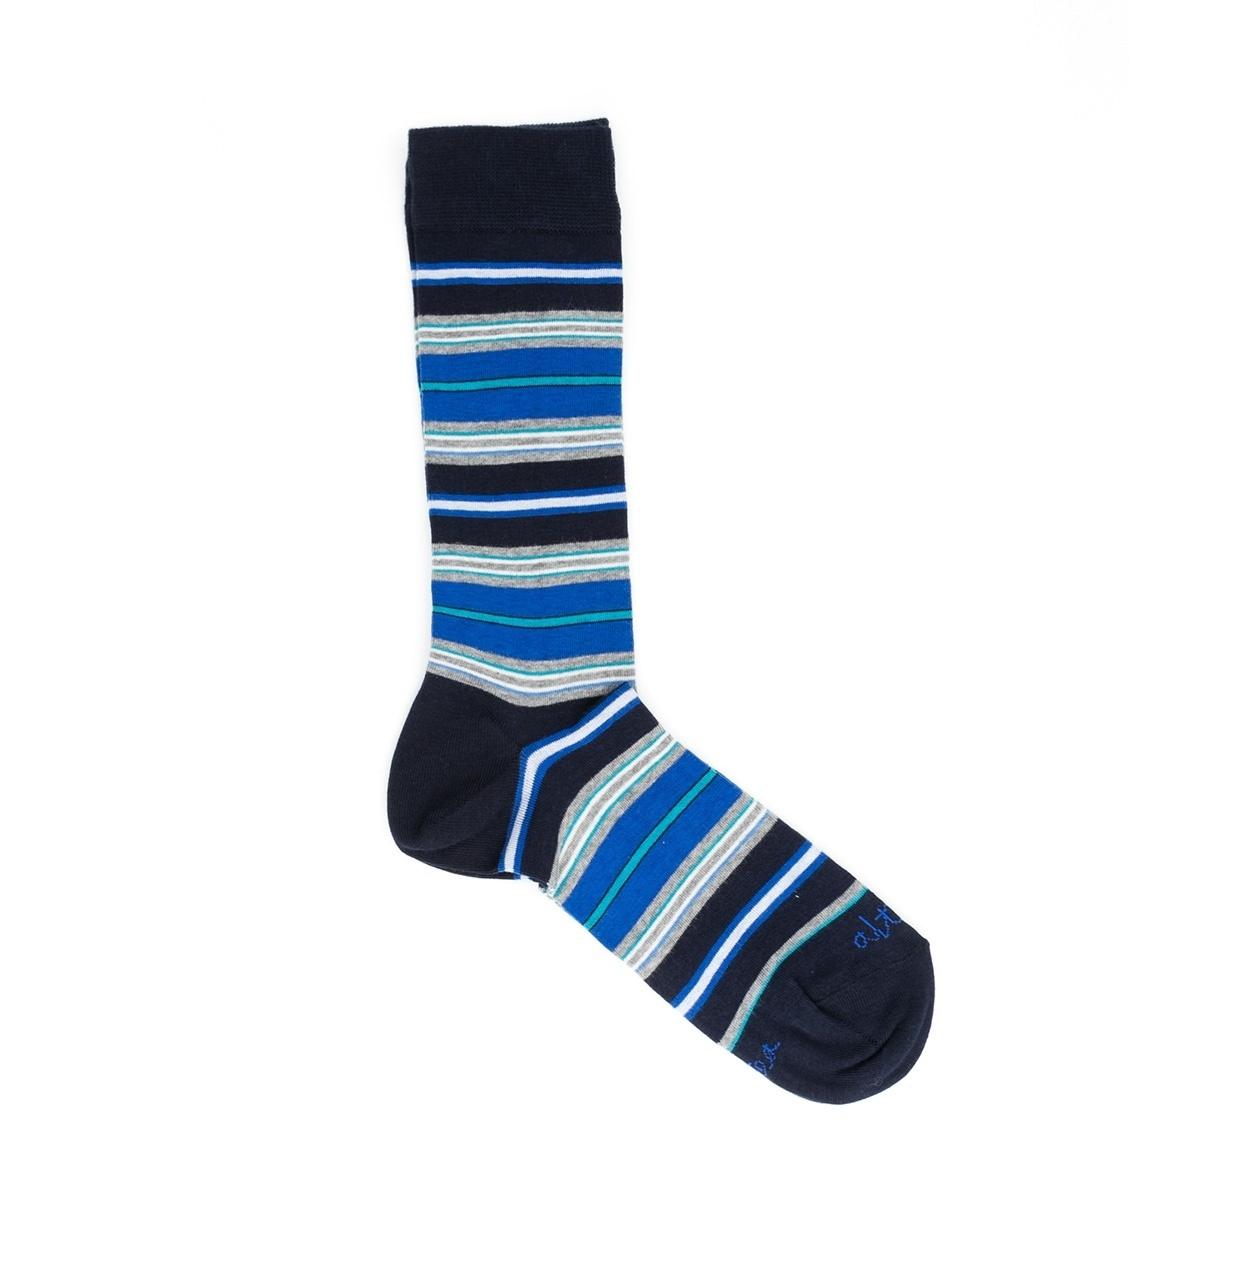 Calcetín multi rayas color azul marino, 100% Algodón.